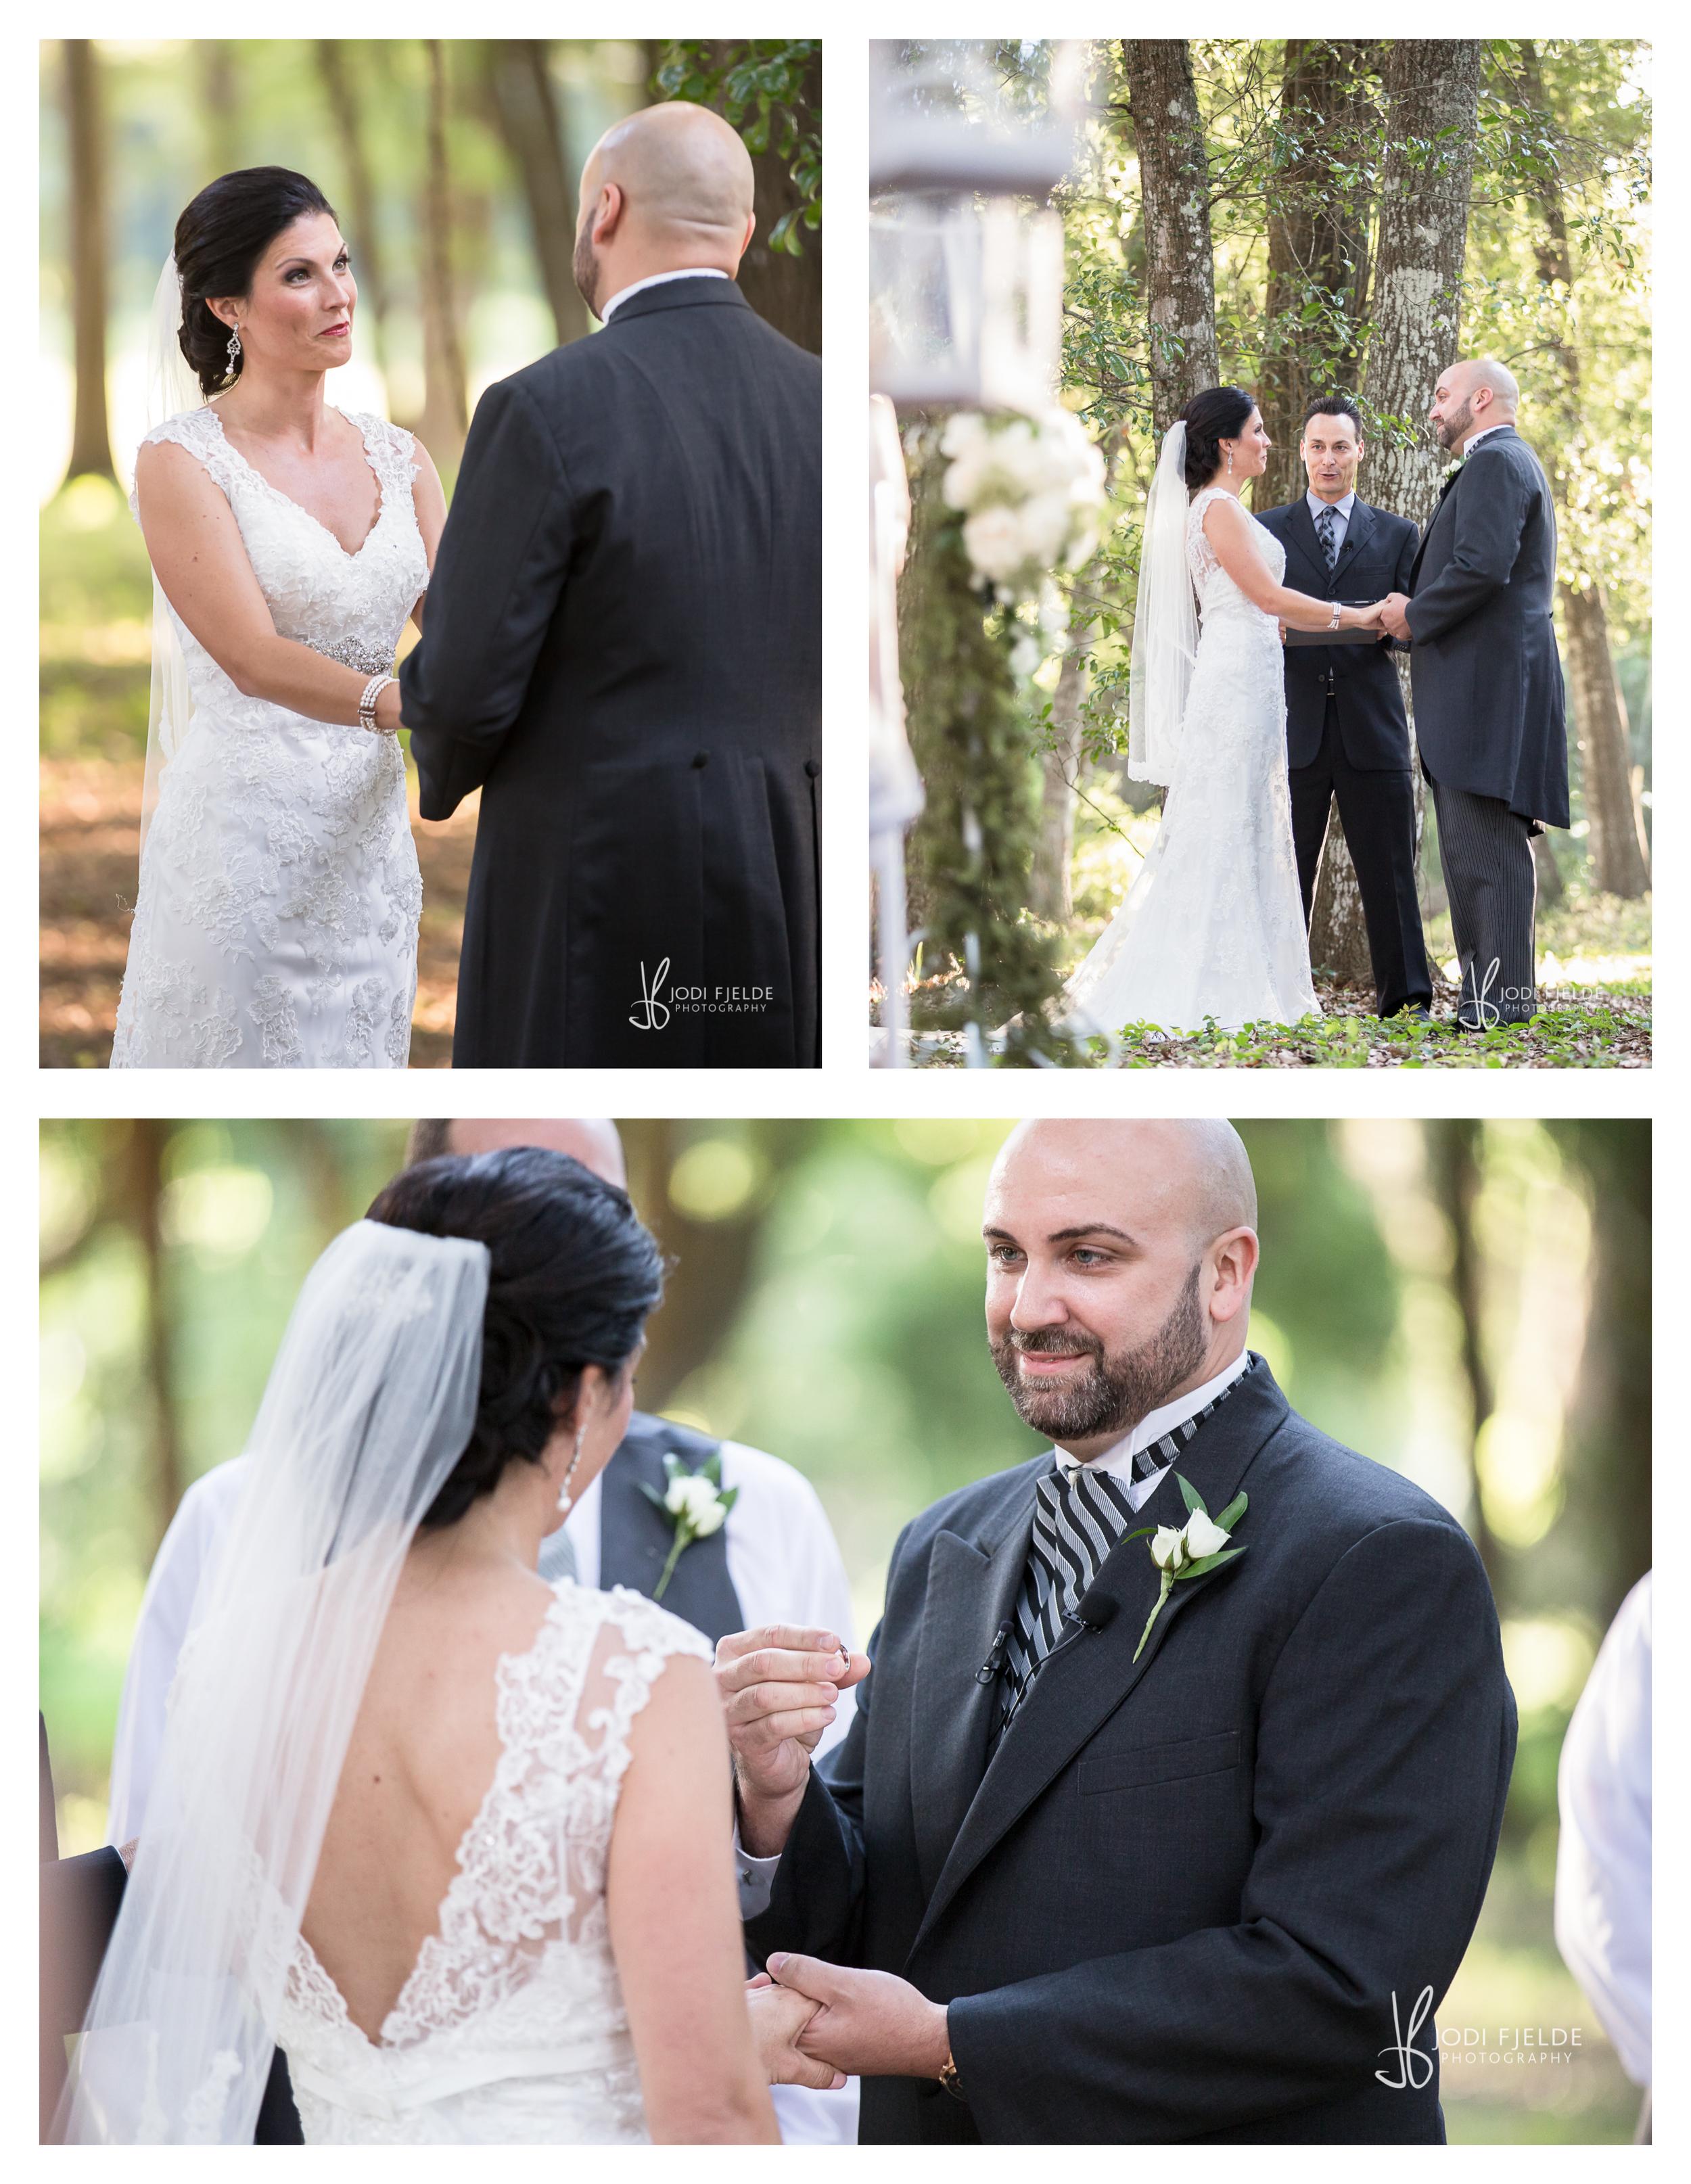 Highland_Manor_Apopka_Florida_wedding_Jackie_&_Tim_photography_jodi_Fjelde_photography-16.jpg